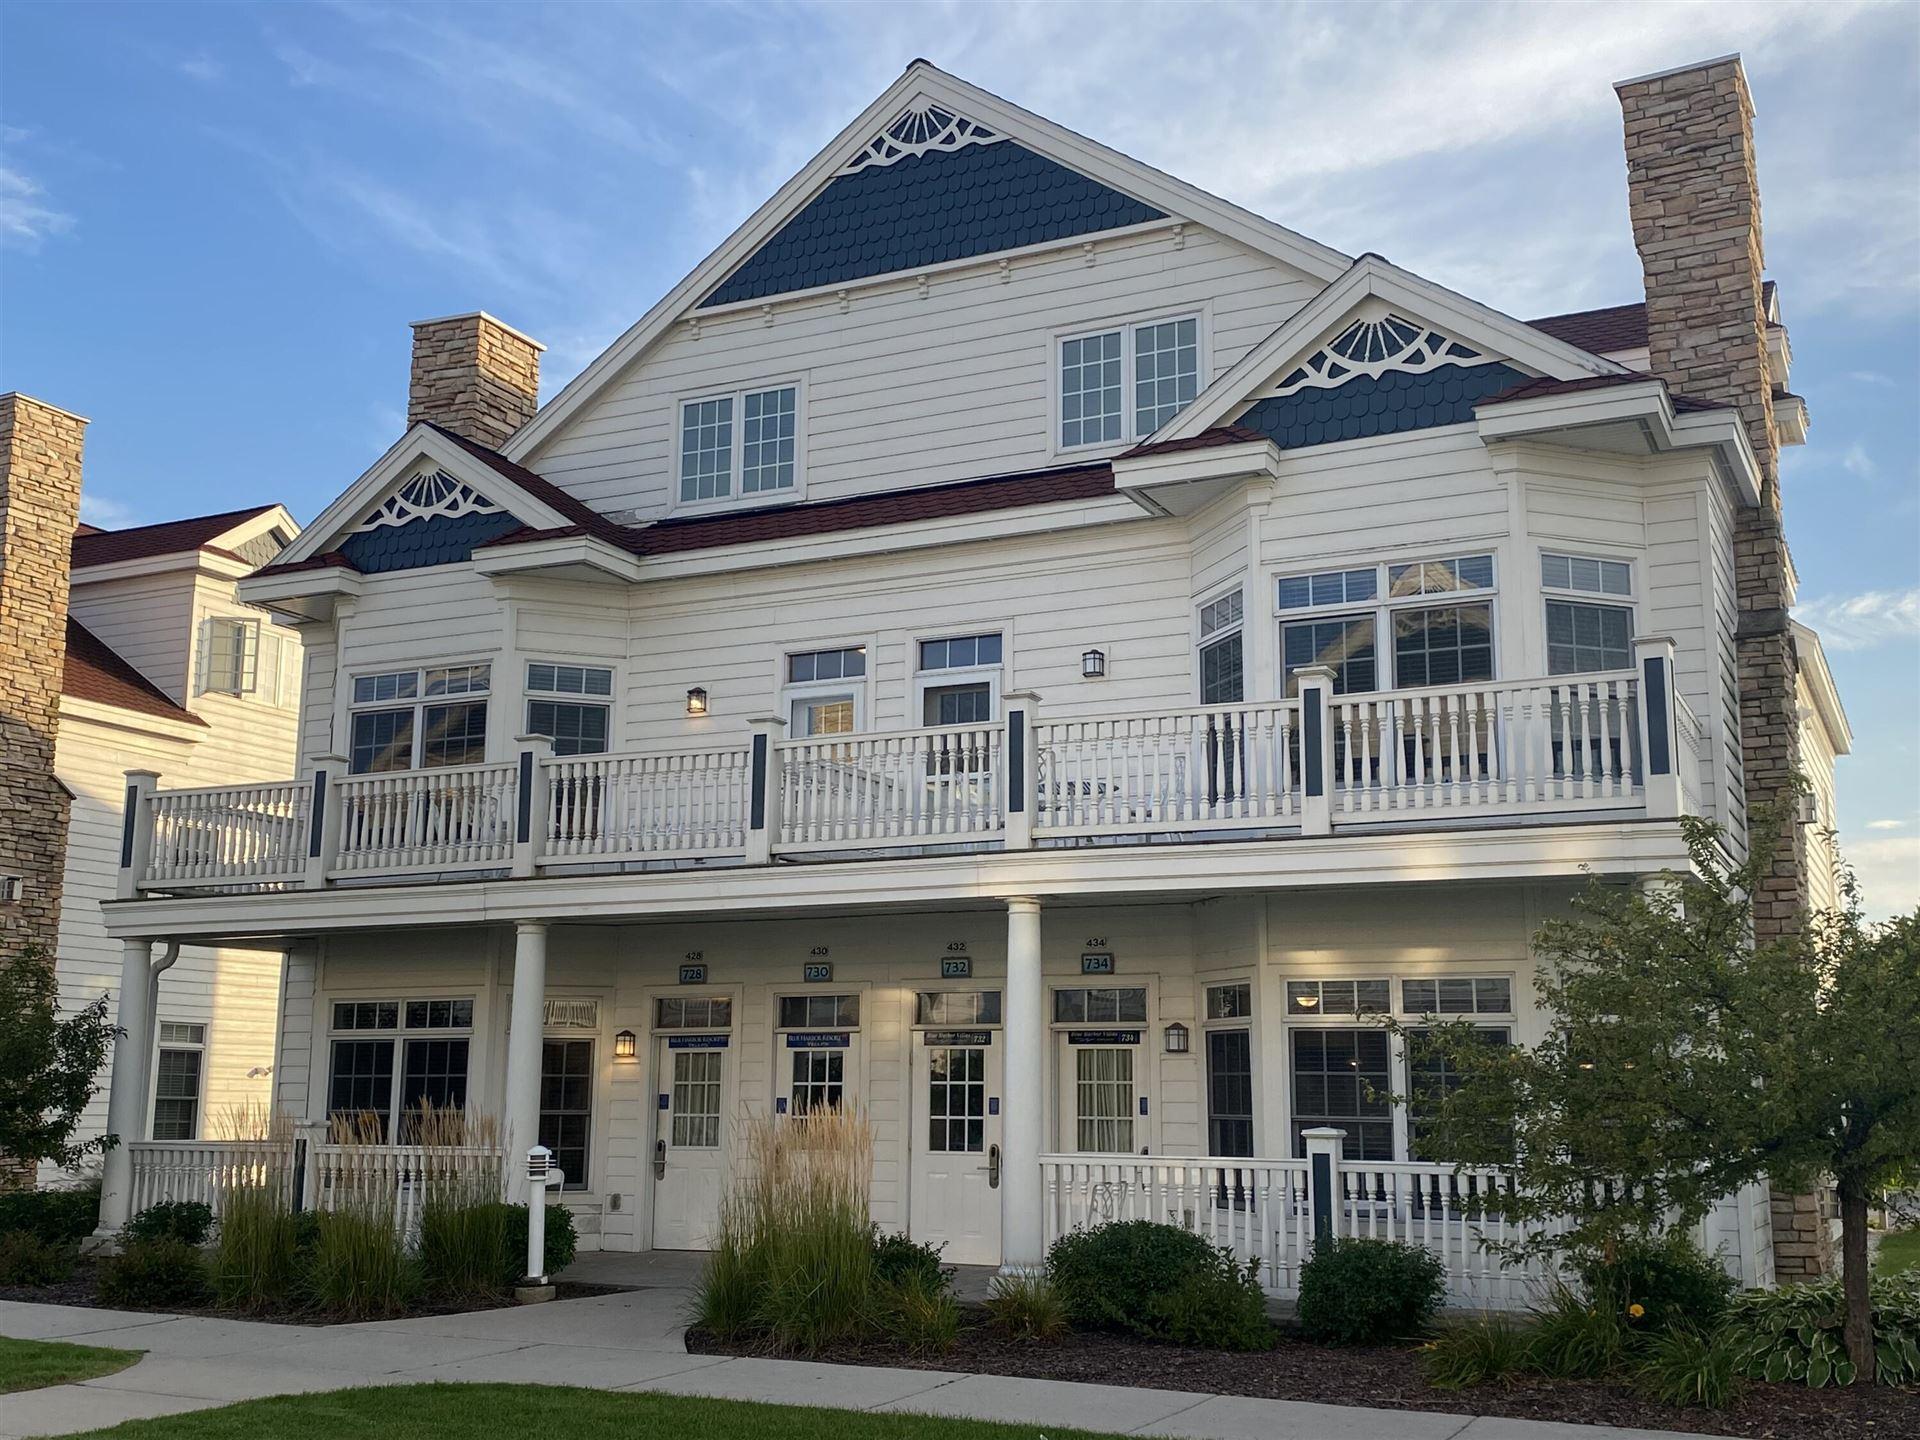 434 Beachfront Ct, Sheboygan, WI 53081 - MLS#: 1759390